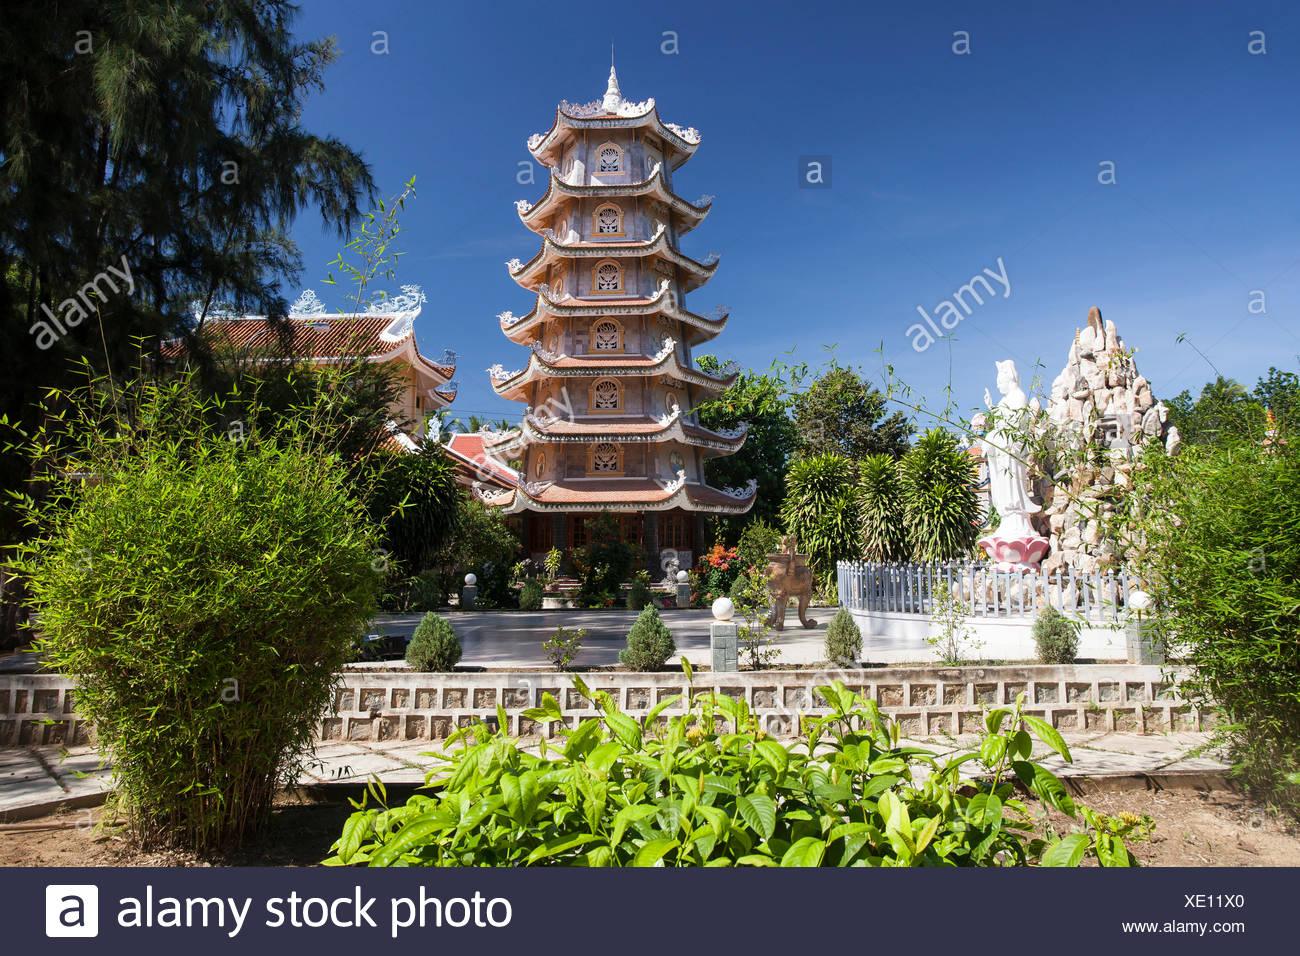 Dieu, An, Thap, Cham, Phan, Rang, Ninh, Rang, outside, pagoda, pagoda tower, place of interest, day, traditional, tower, Vietnam, Stock Photo